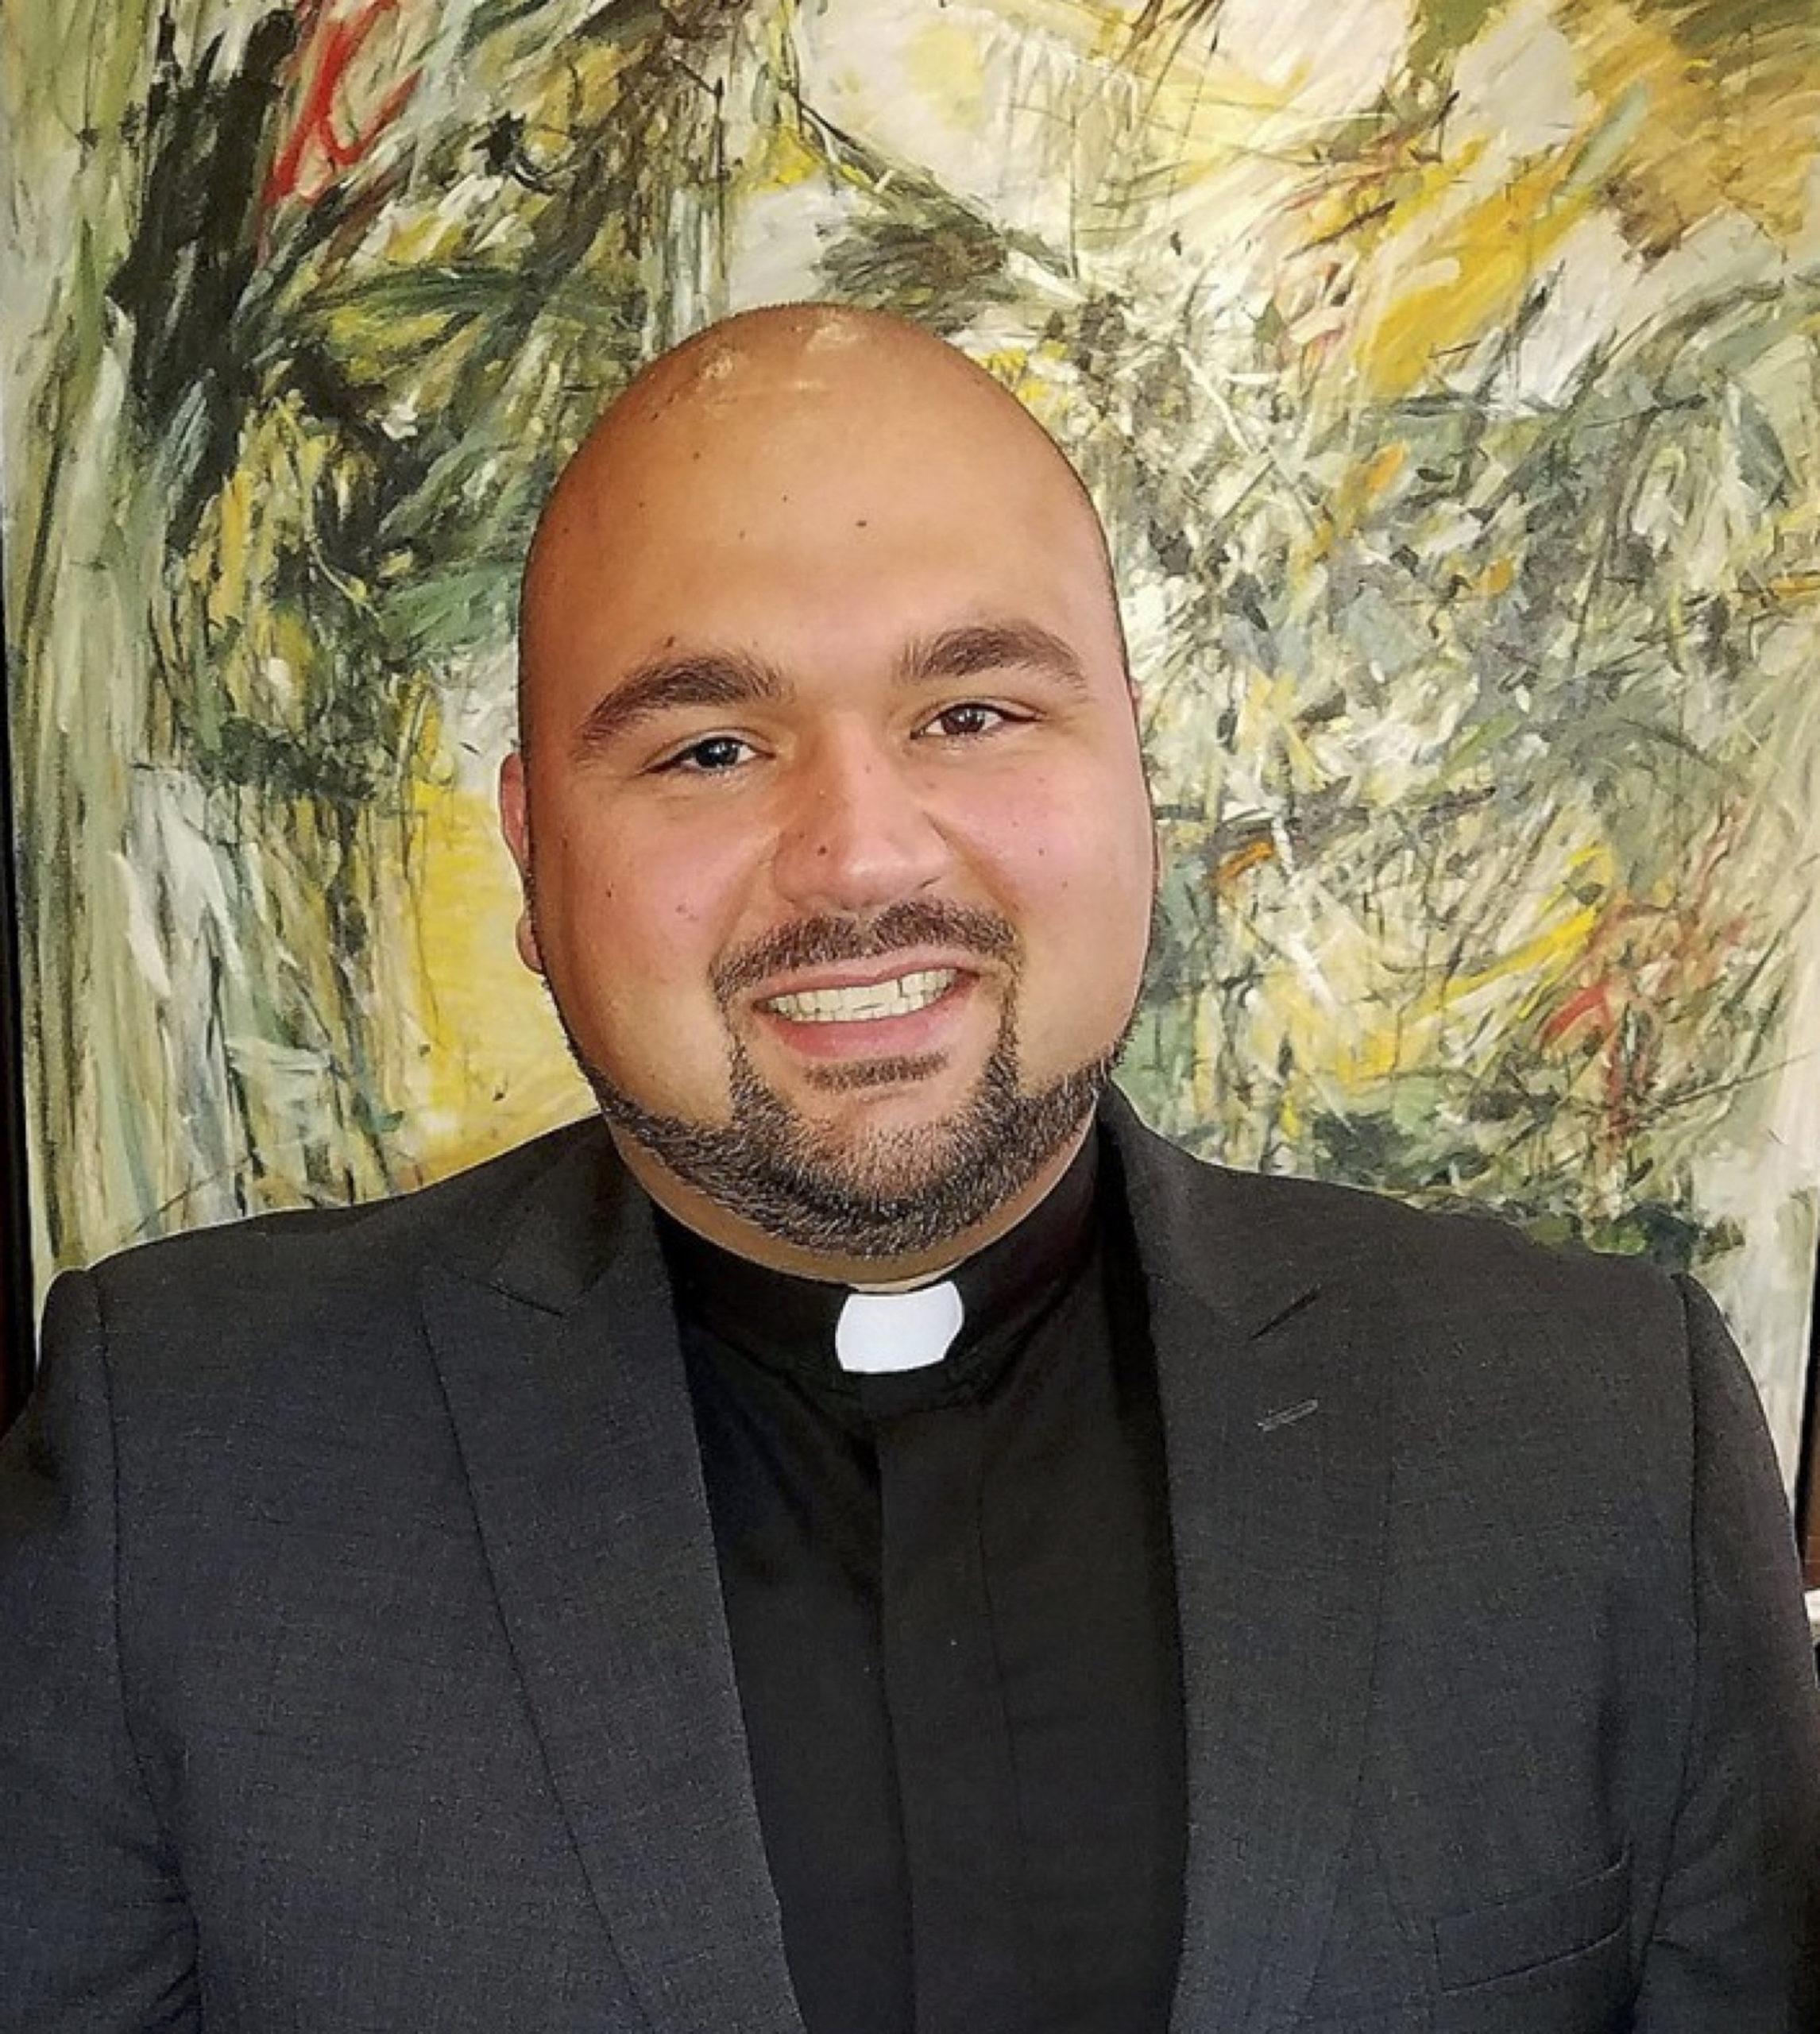 Our Pastor: Father Tony Massad